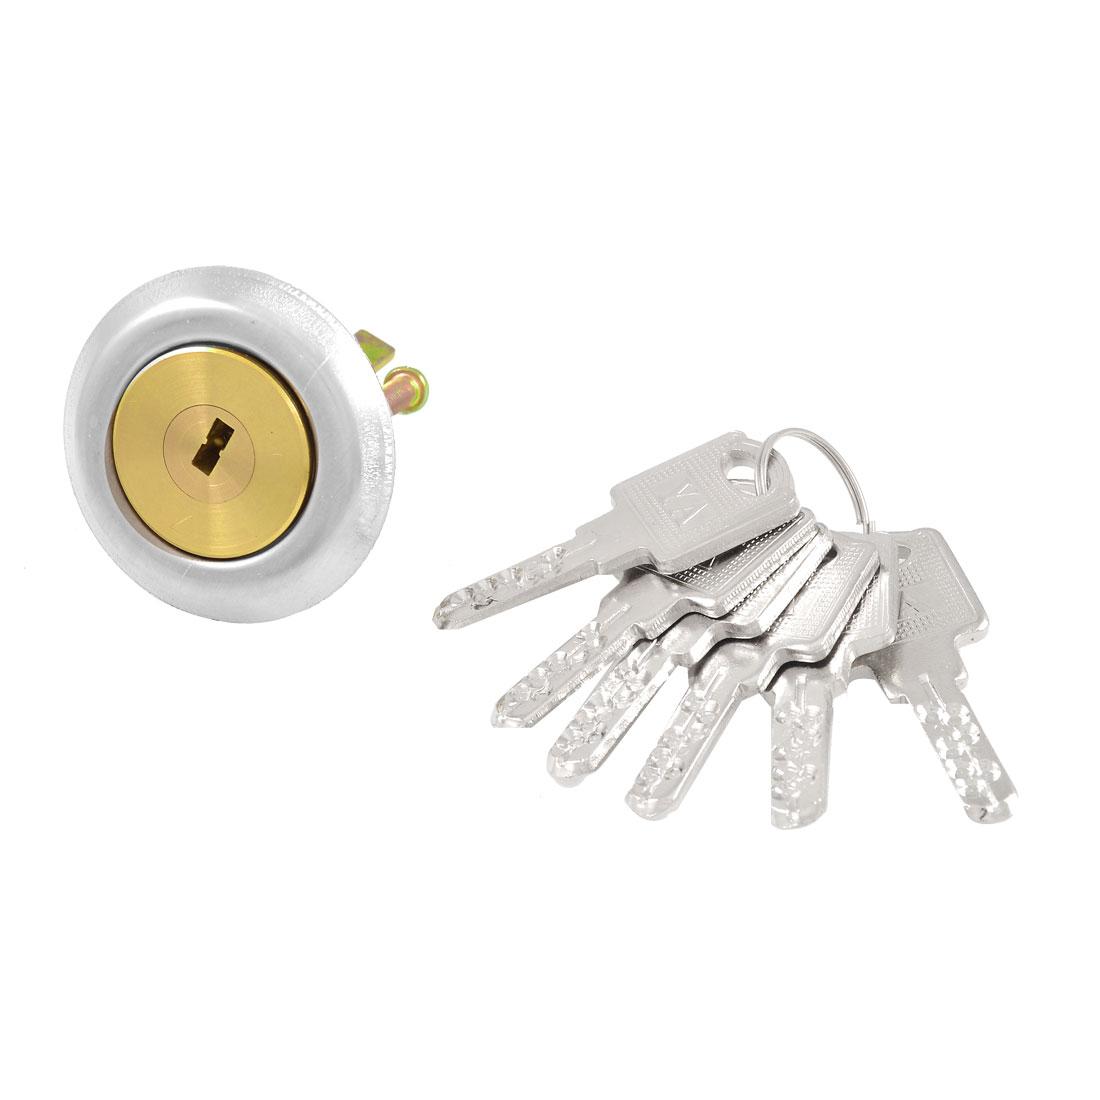 Office Cabinet Drawer Anti-Theft Deadbolt Cylinder Lock + 6 Keys